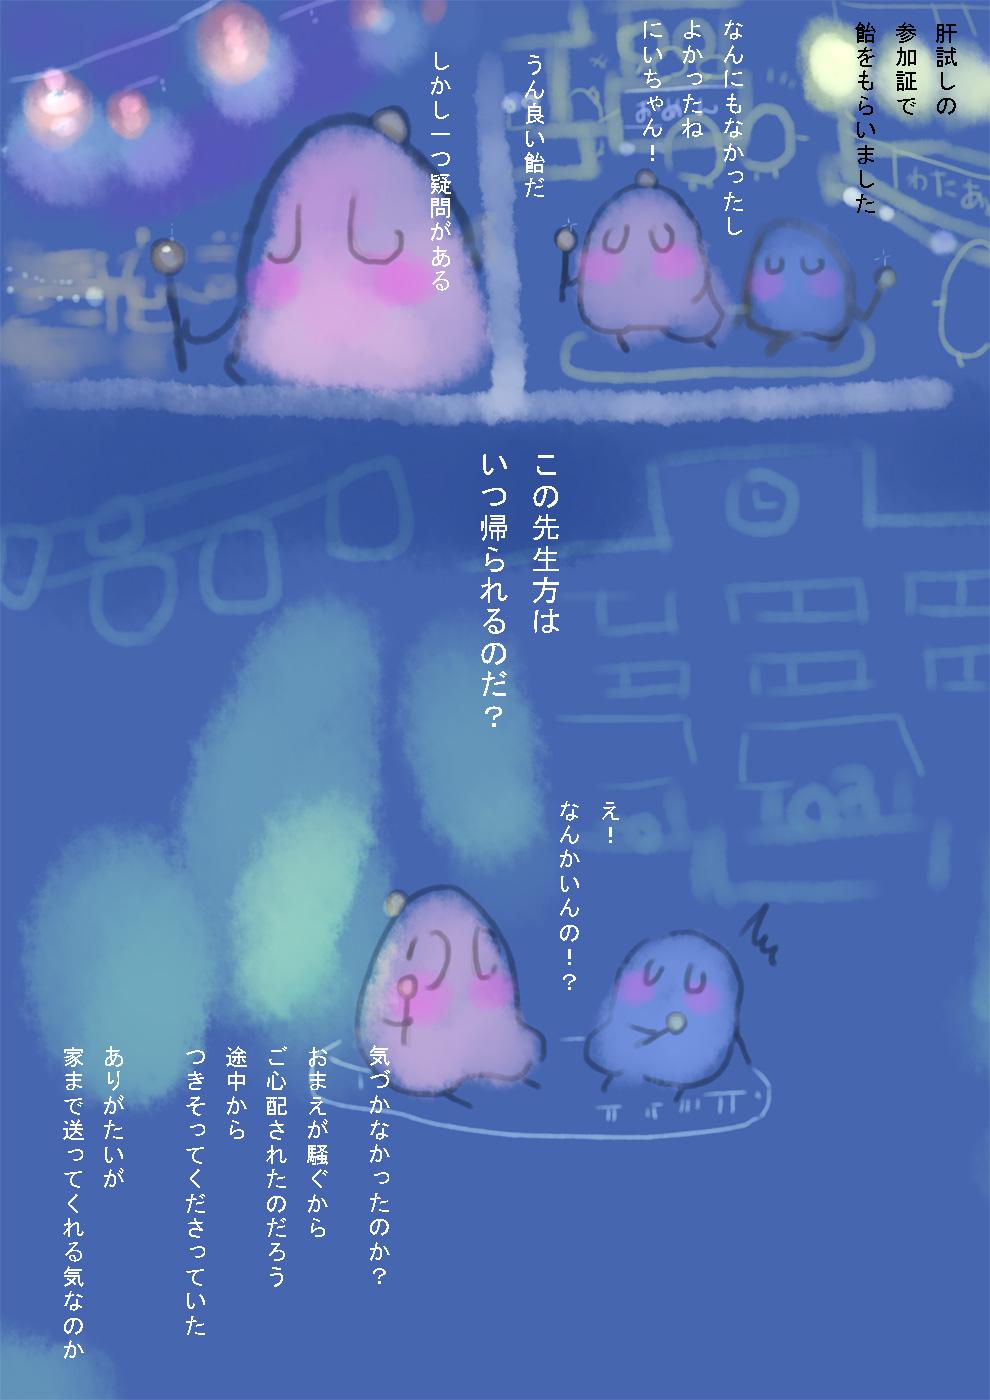 http://ahito.com/comic/short/poji/img/2018/poji20180515_2.jpg